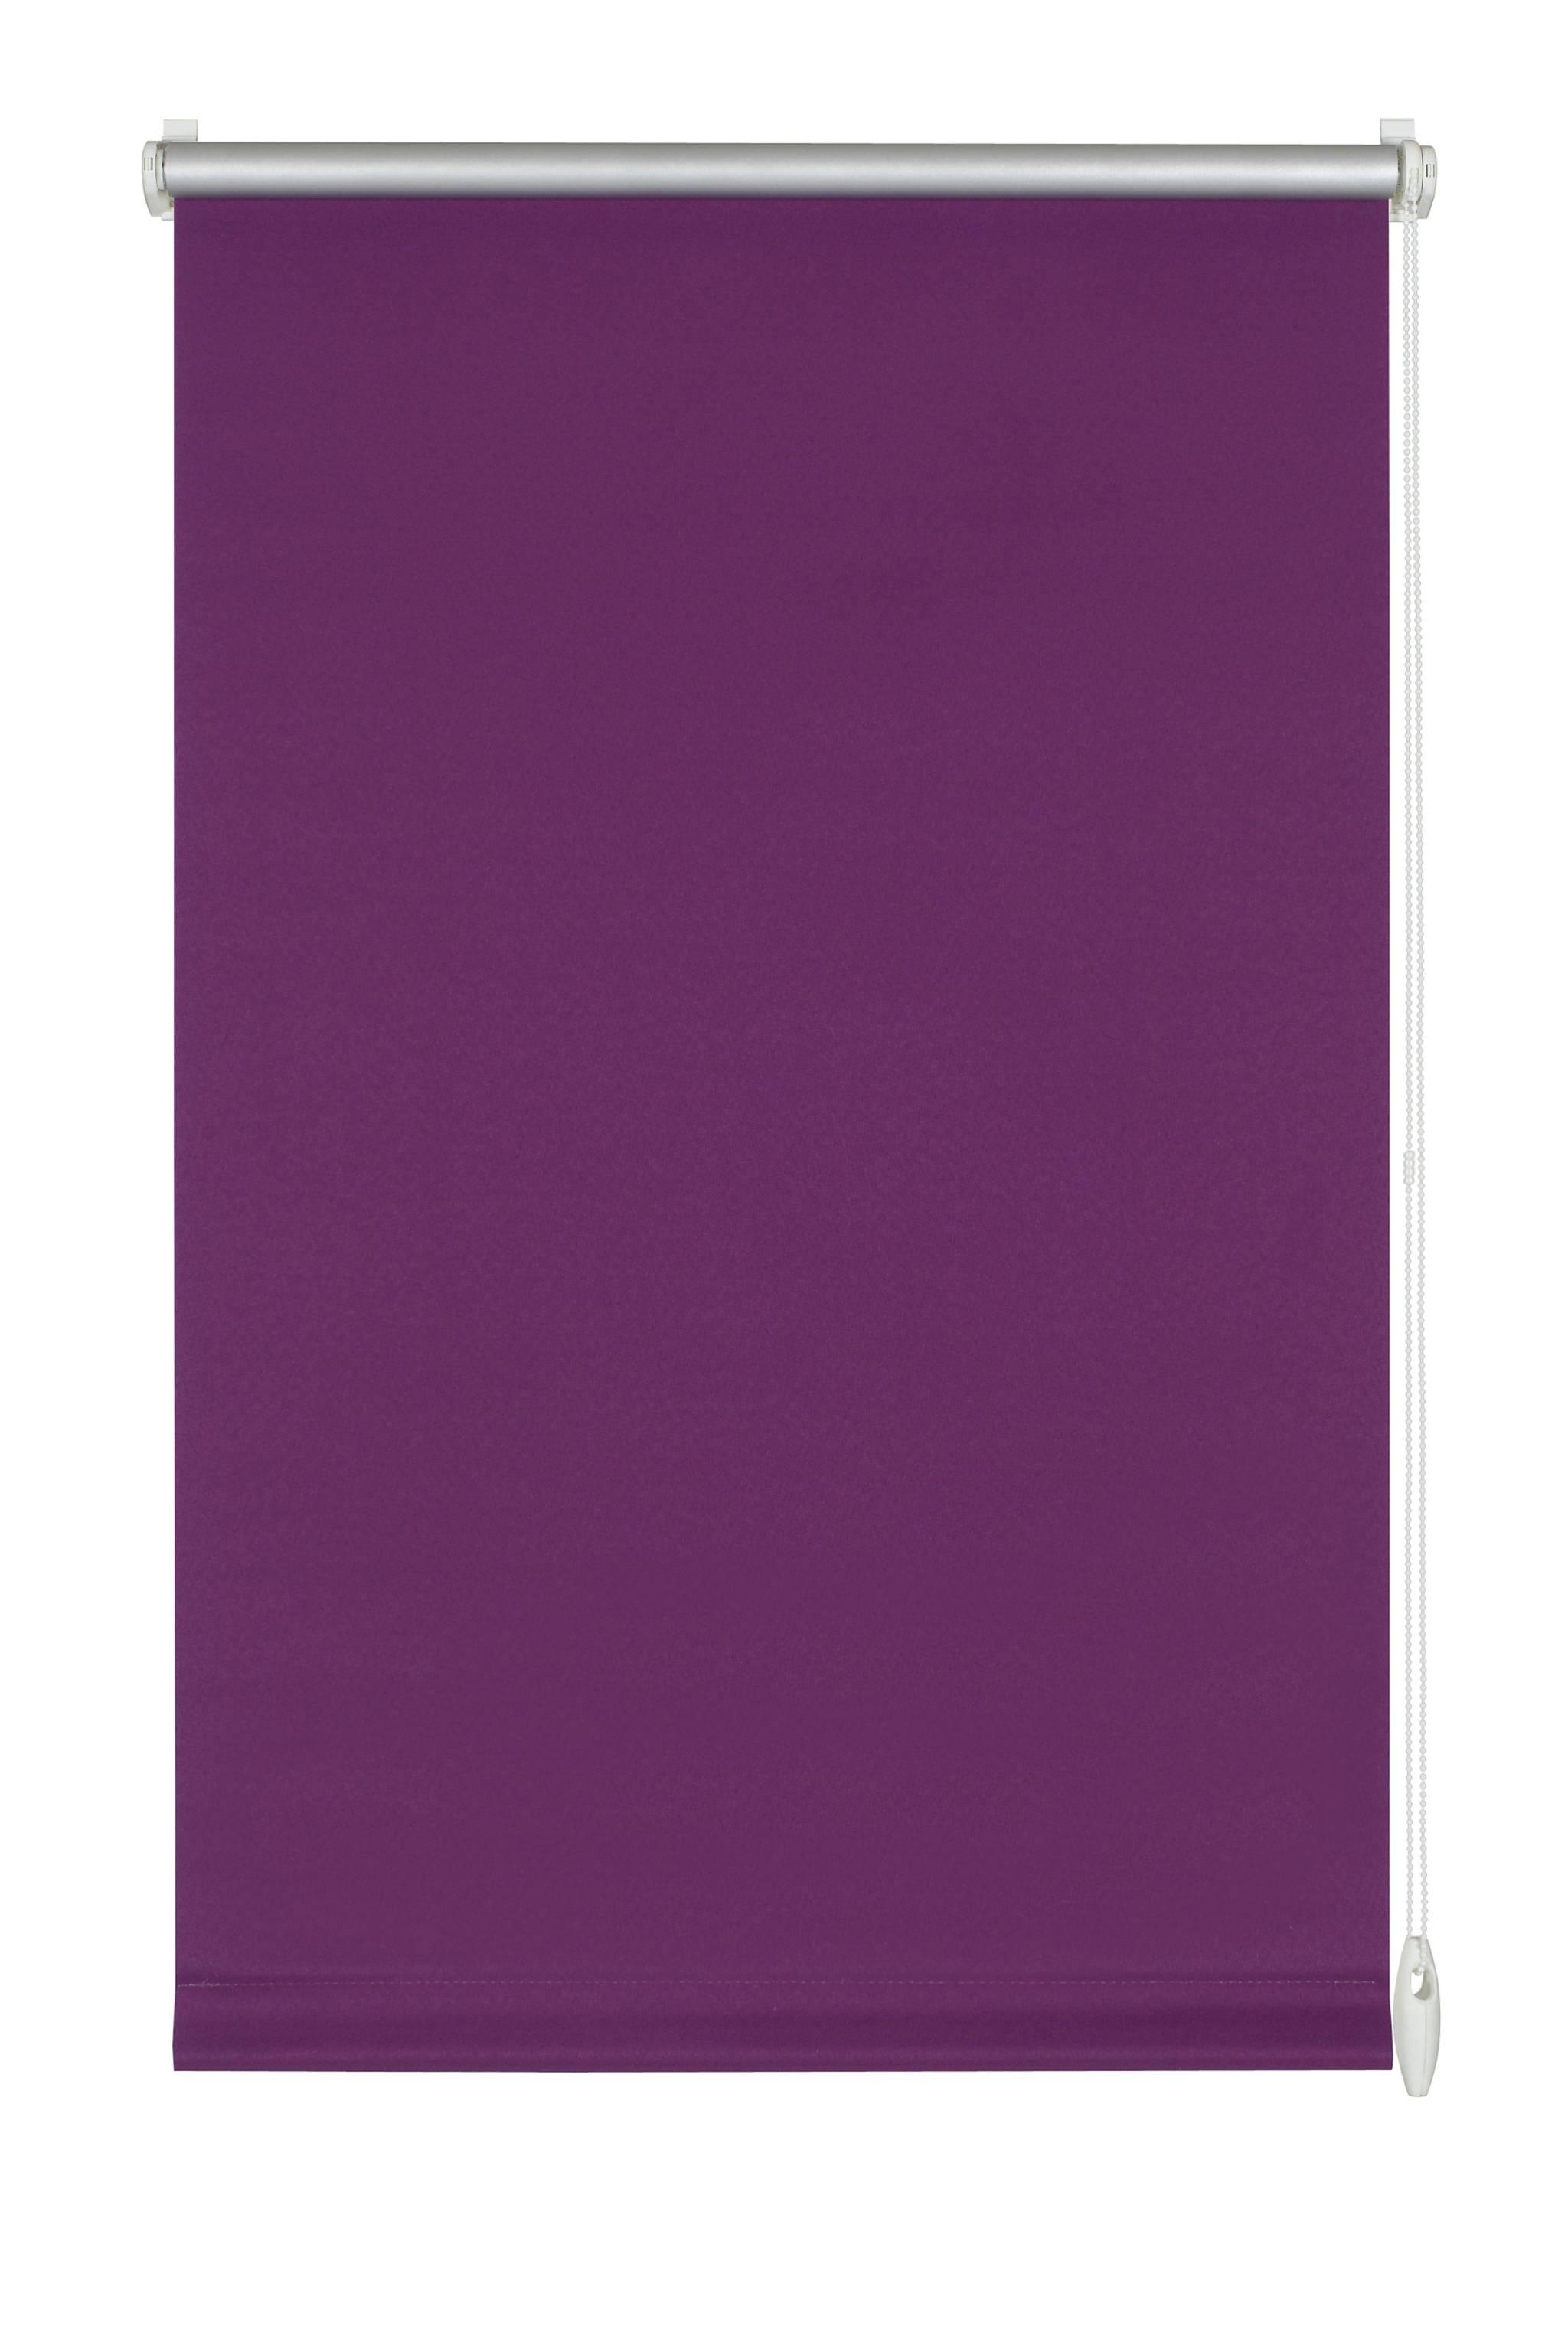 easyfix rollo thermo lila 45 x 150 cm 31182. Black Bedroom Furniture Sets. Home Design Ideas